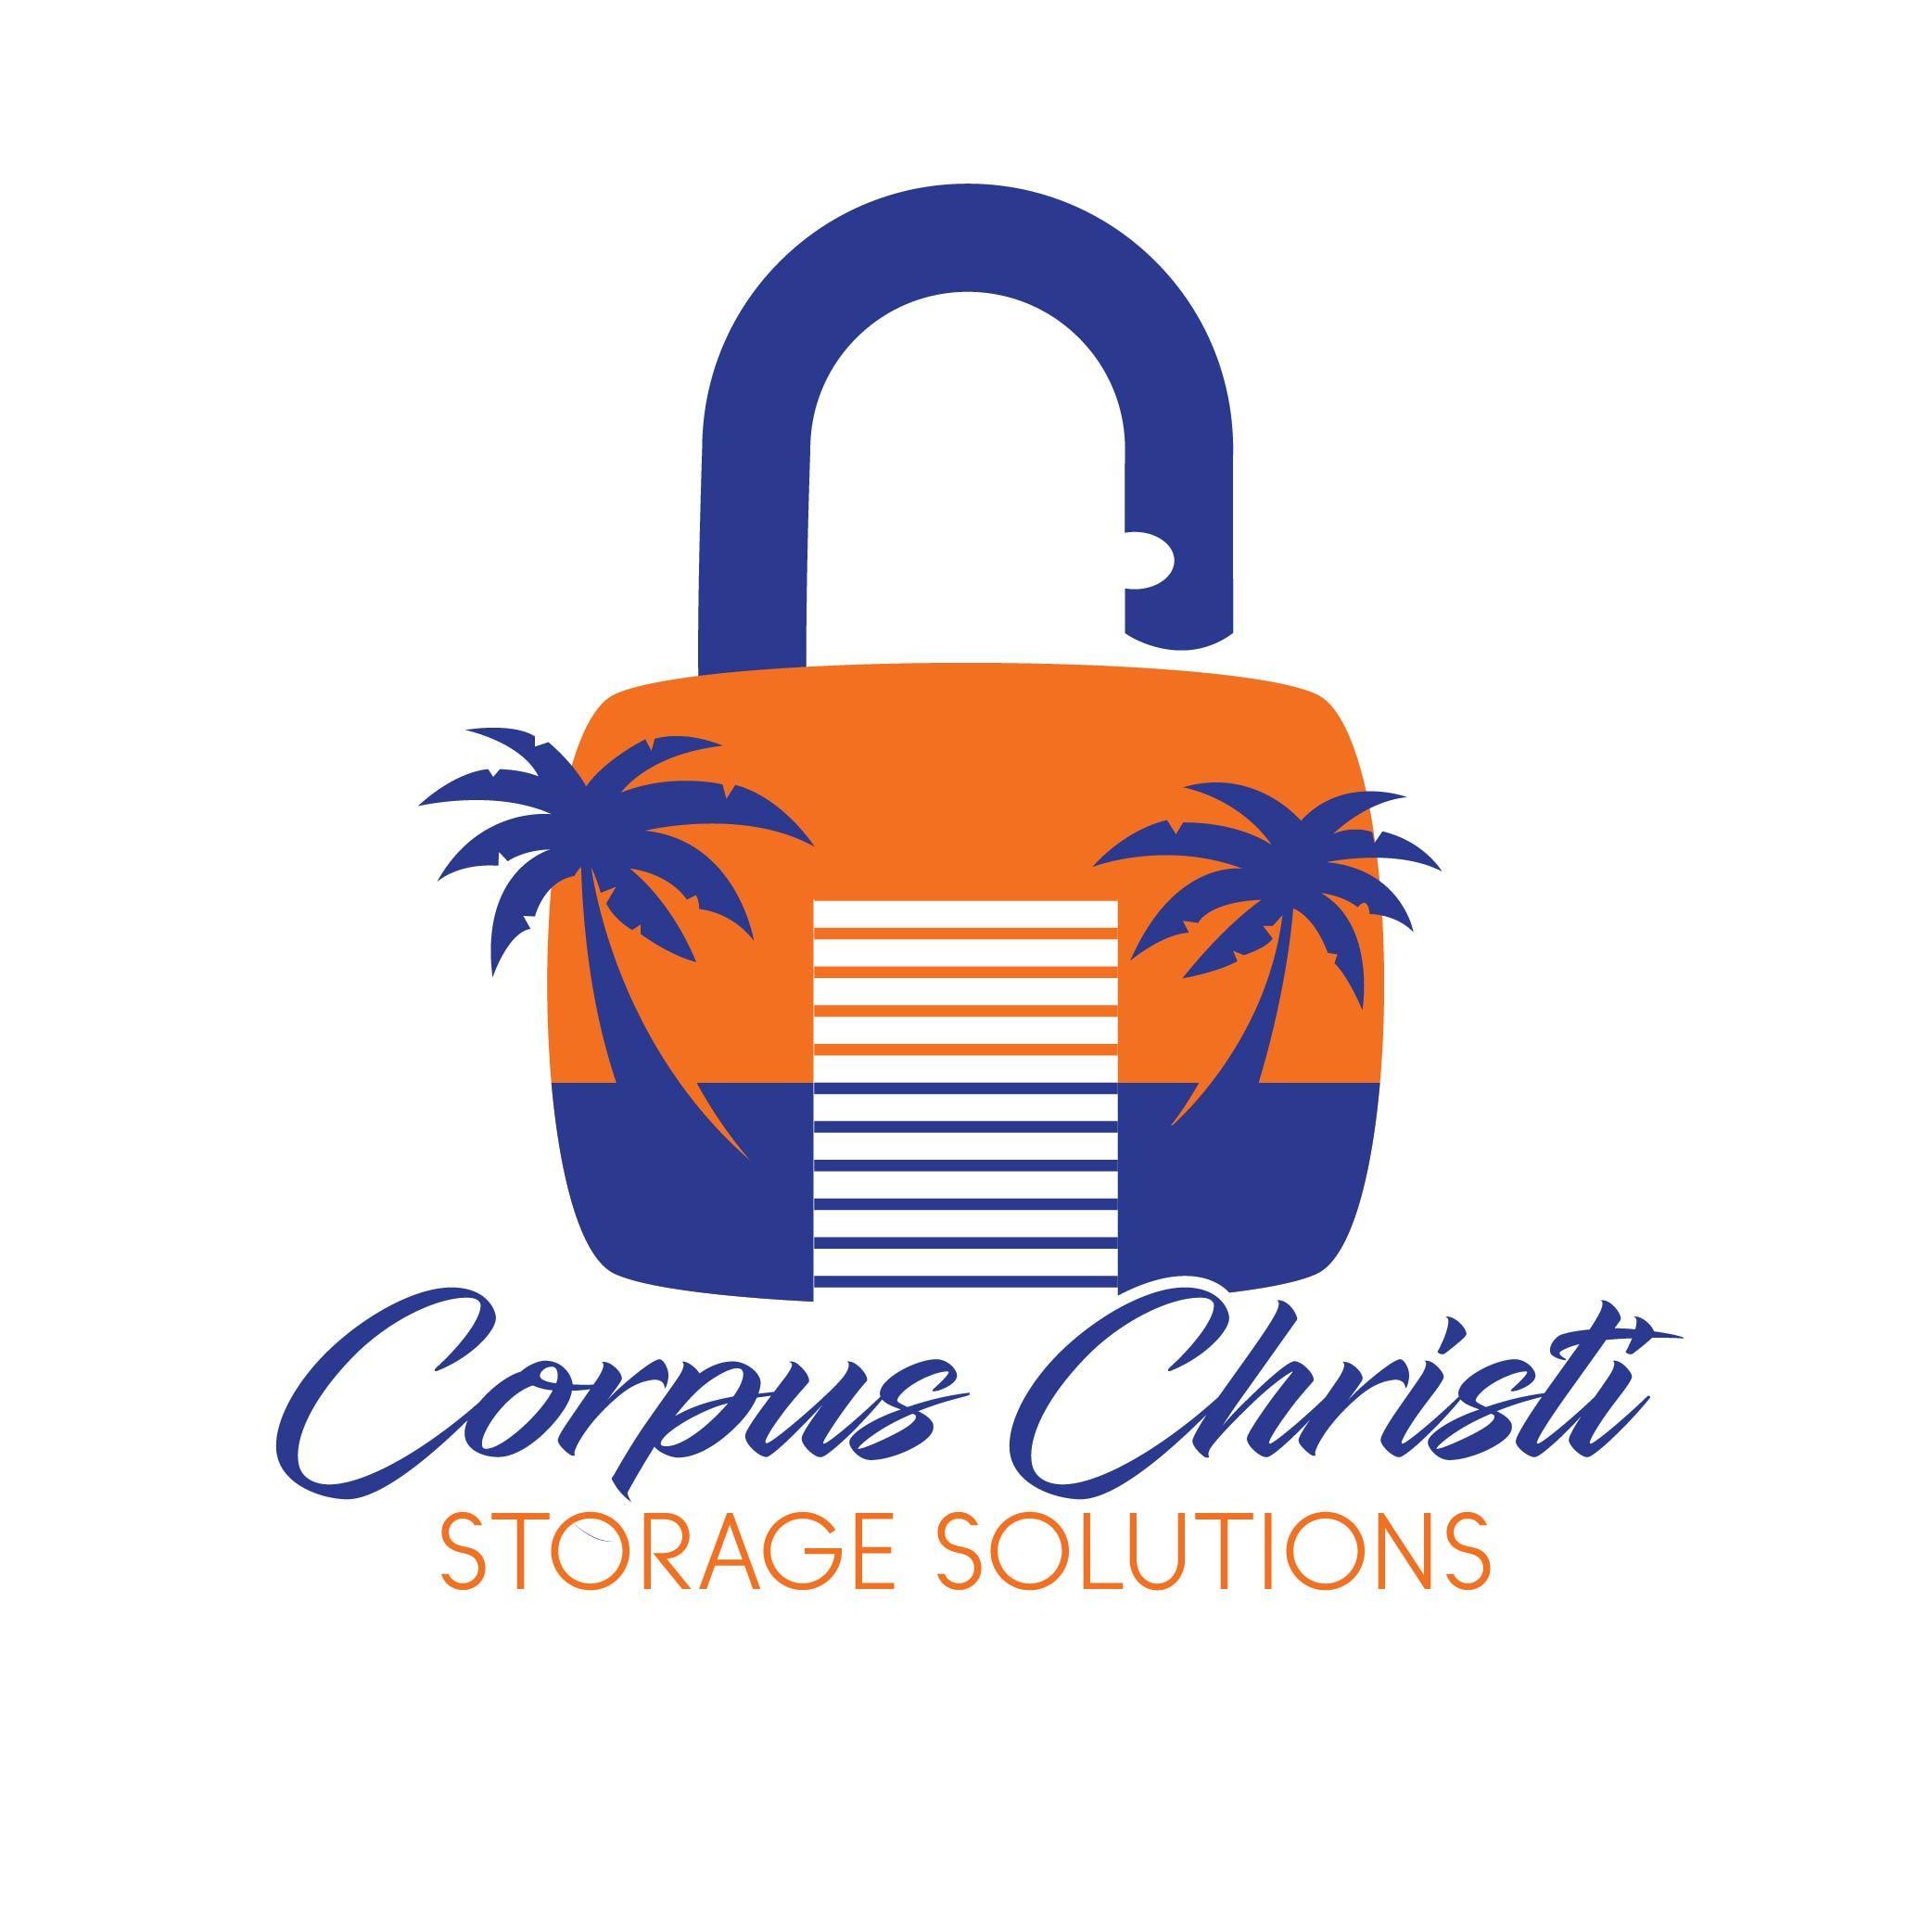 Corpus Christi Storage Solutions, LLC